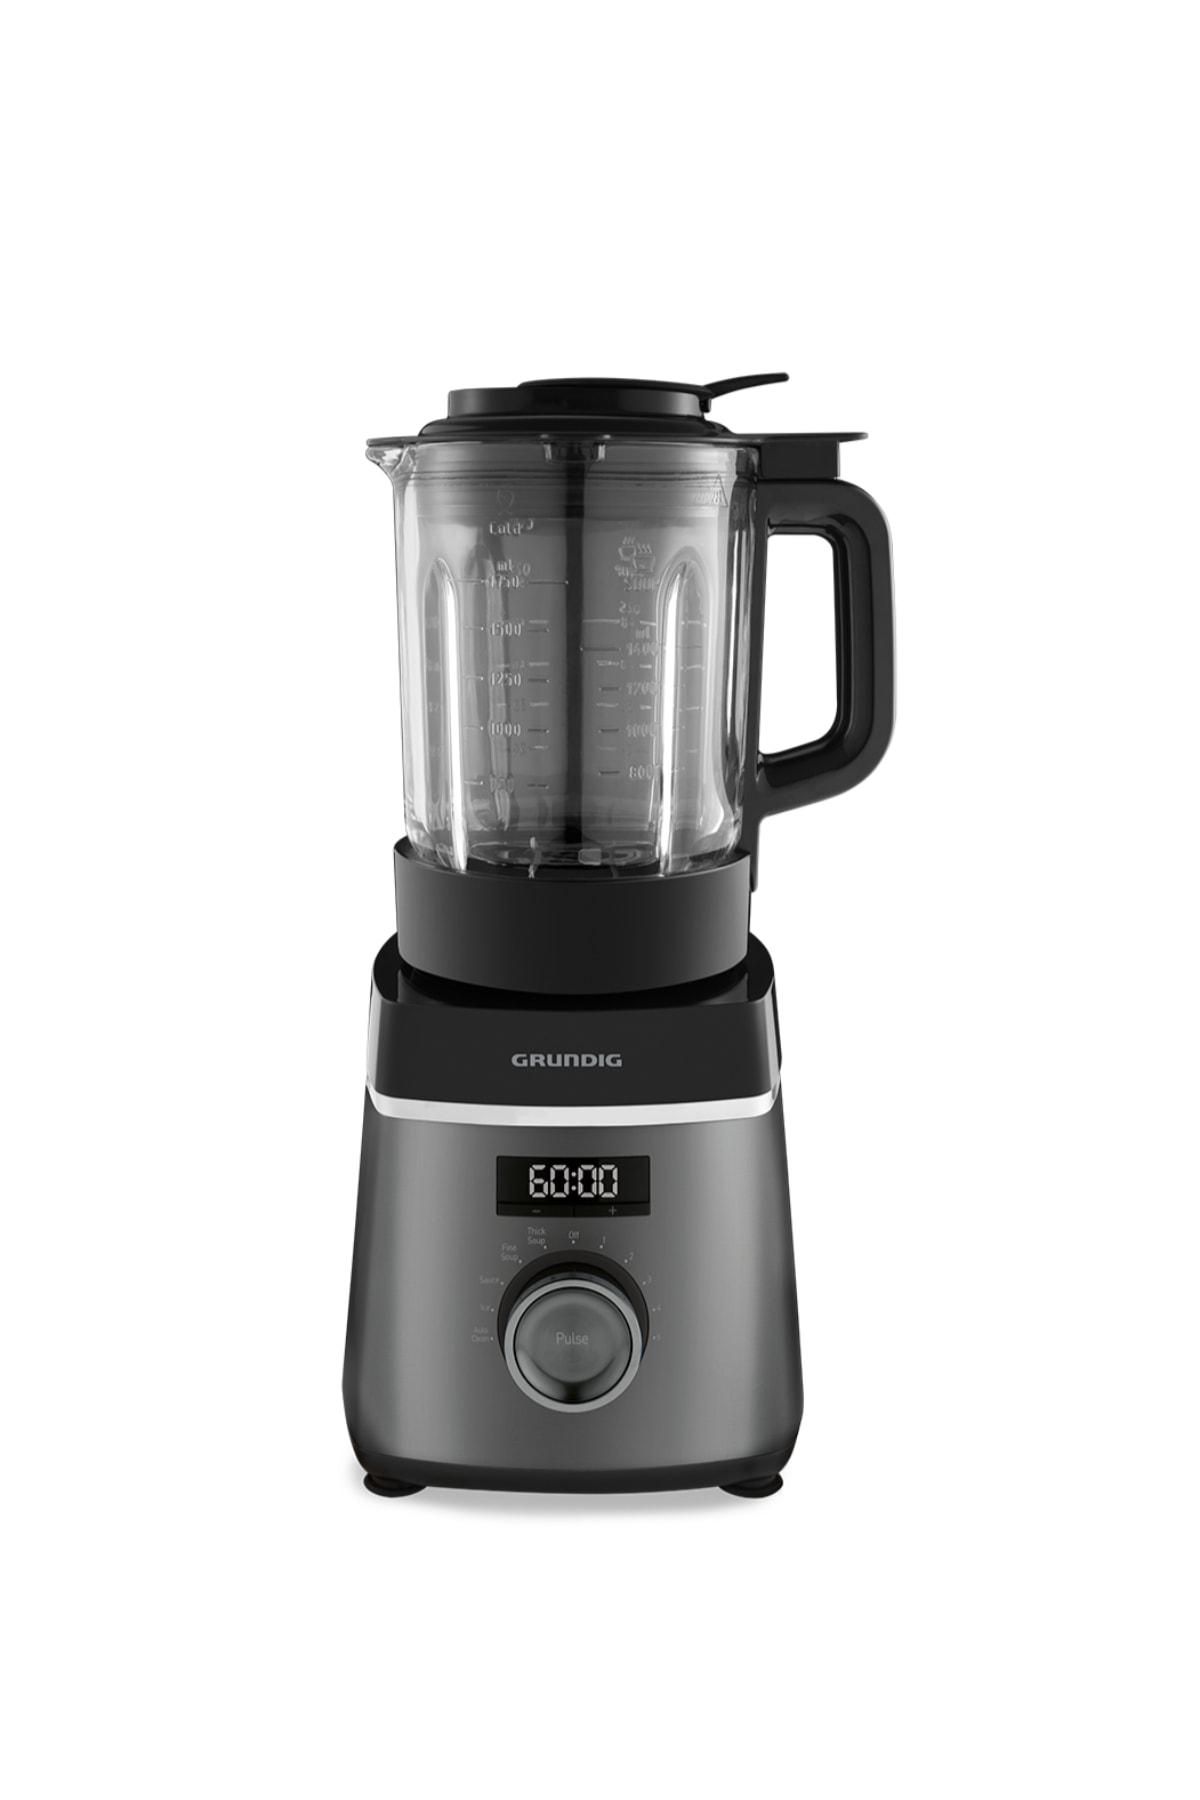 Grundig CB 8760 Professional Line Soup Maker ve Blender - Çorba Makinesi 1